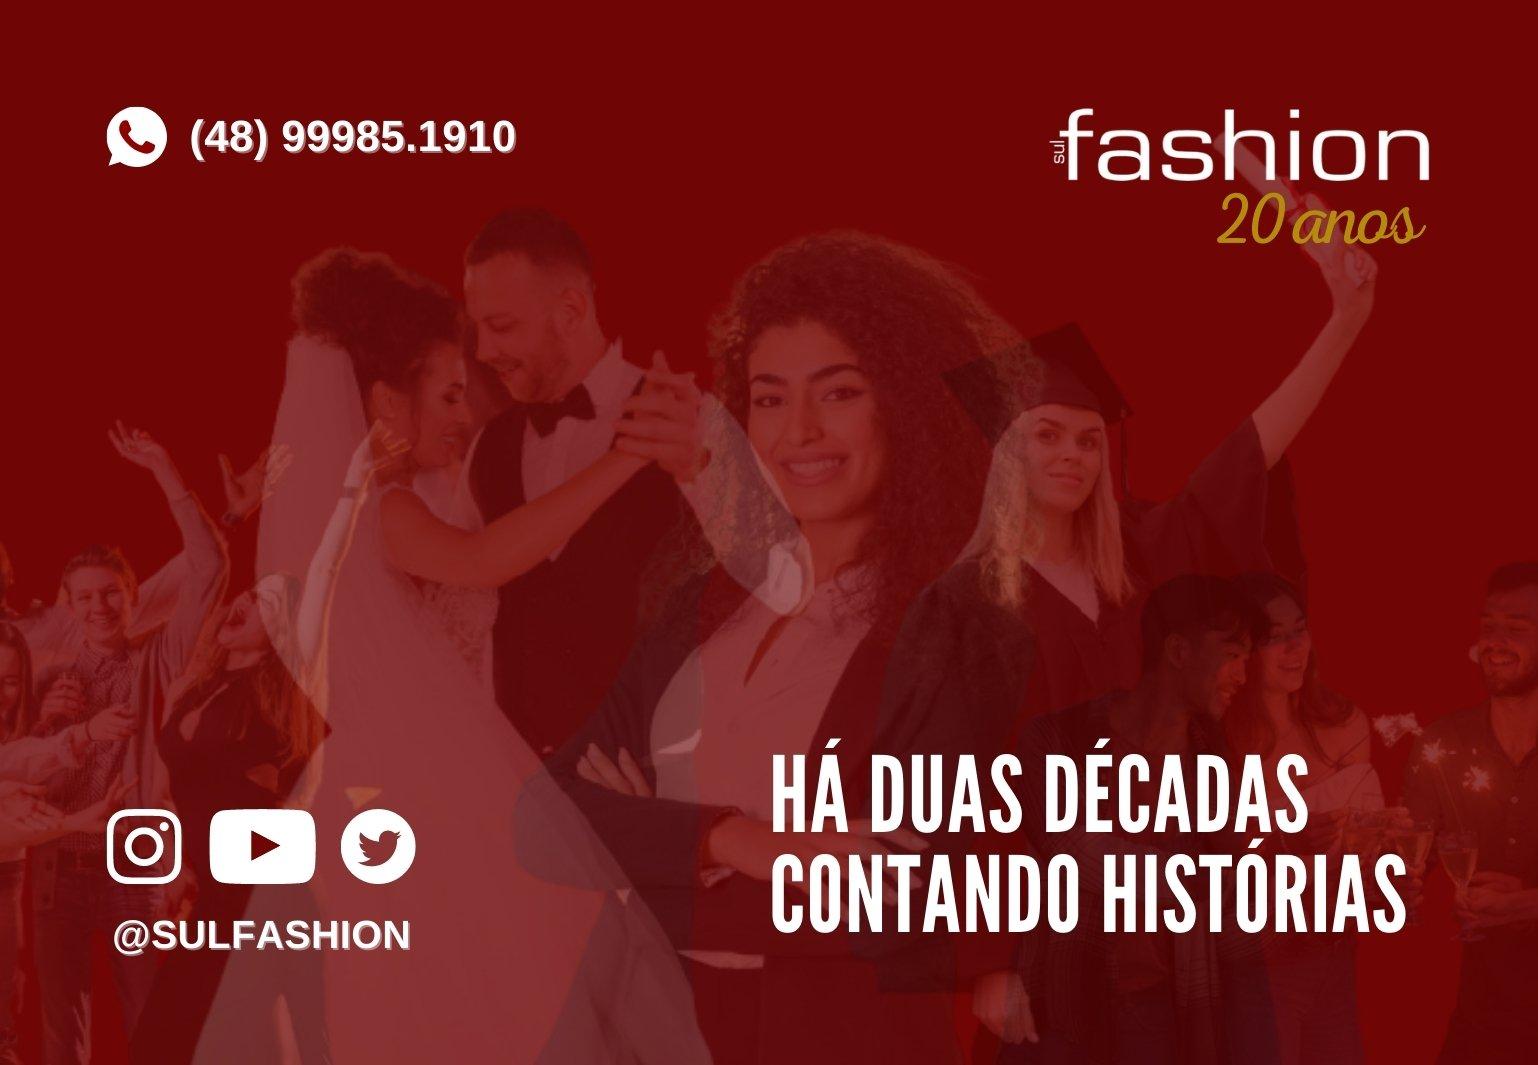 Sul Fashion 20 anos